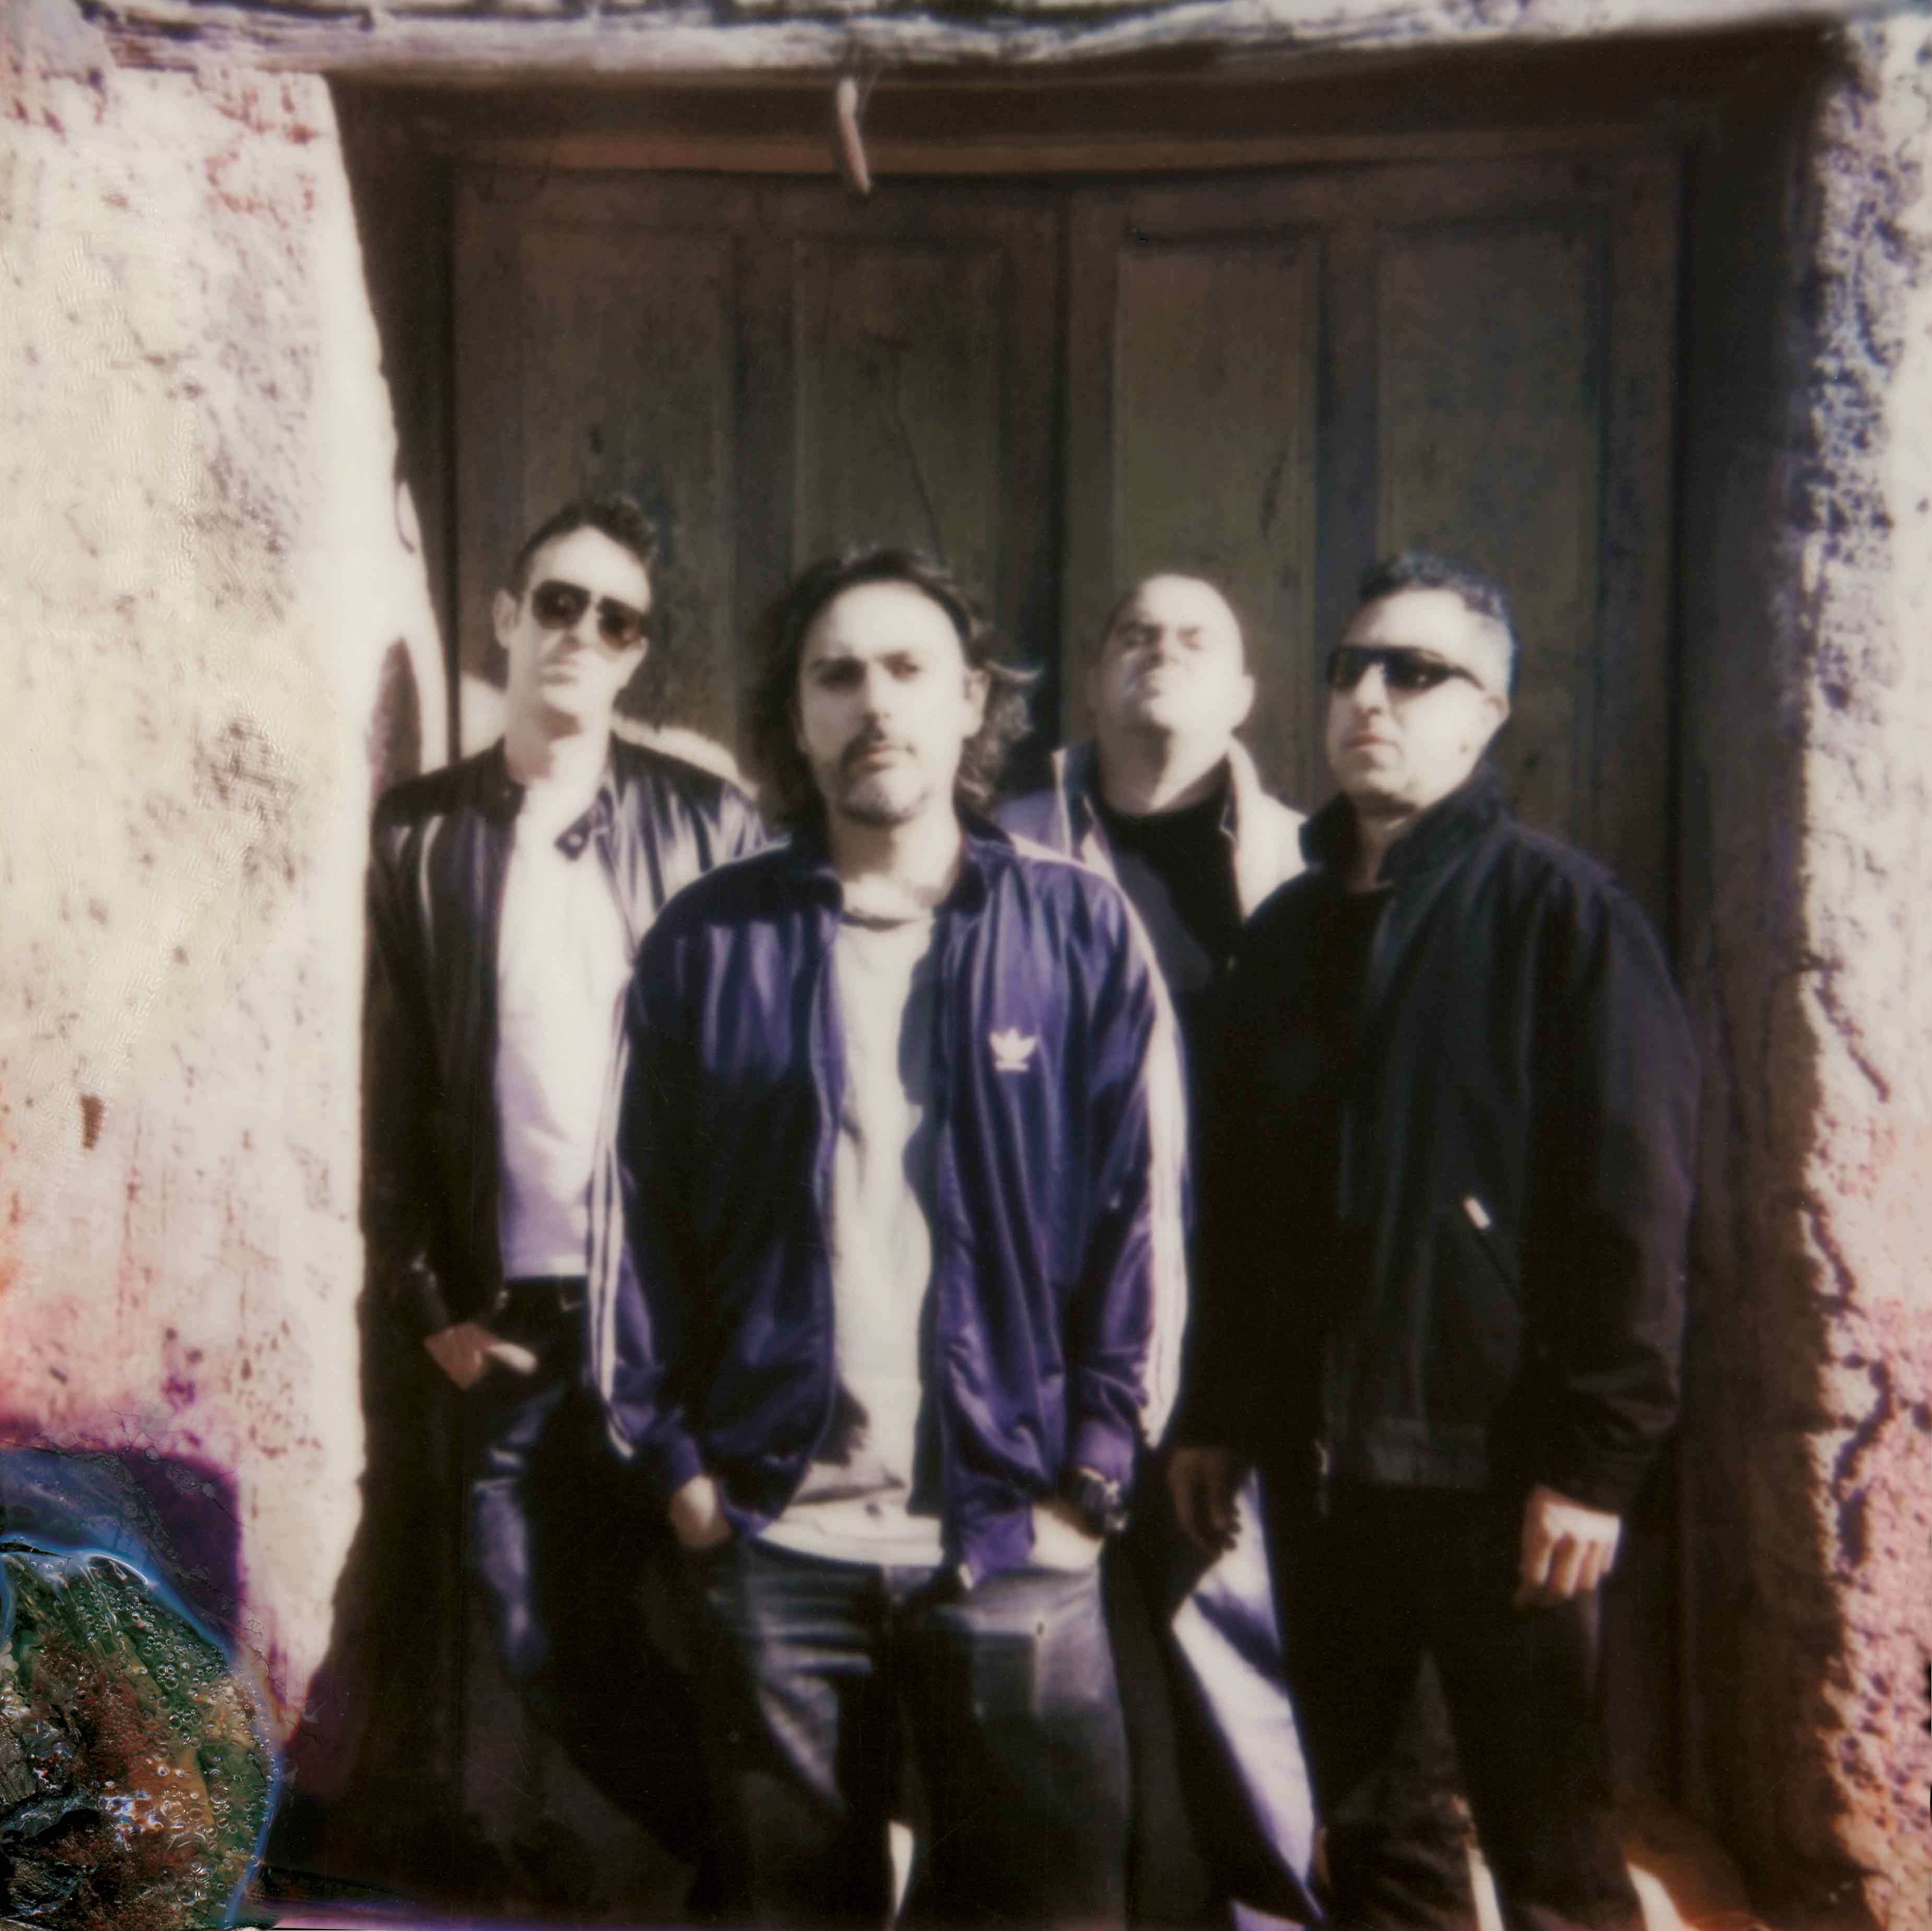 Franky B & The Cryptic Monkeys